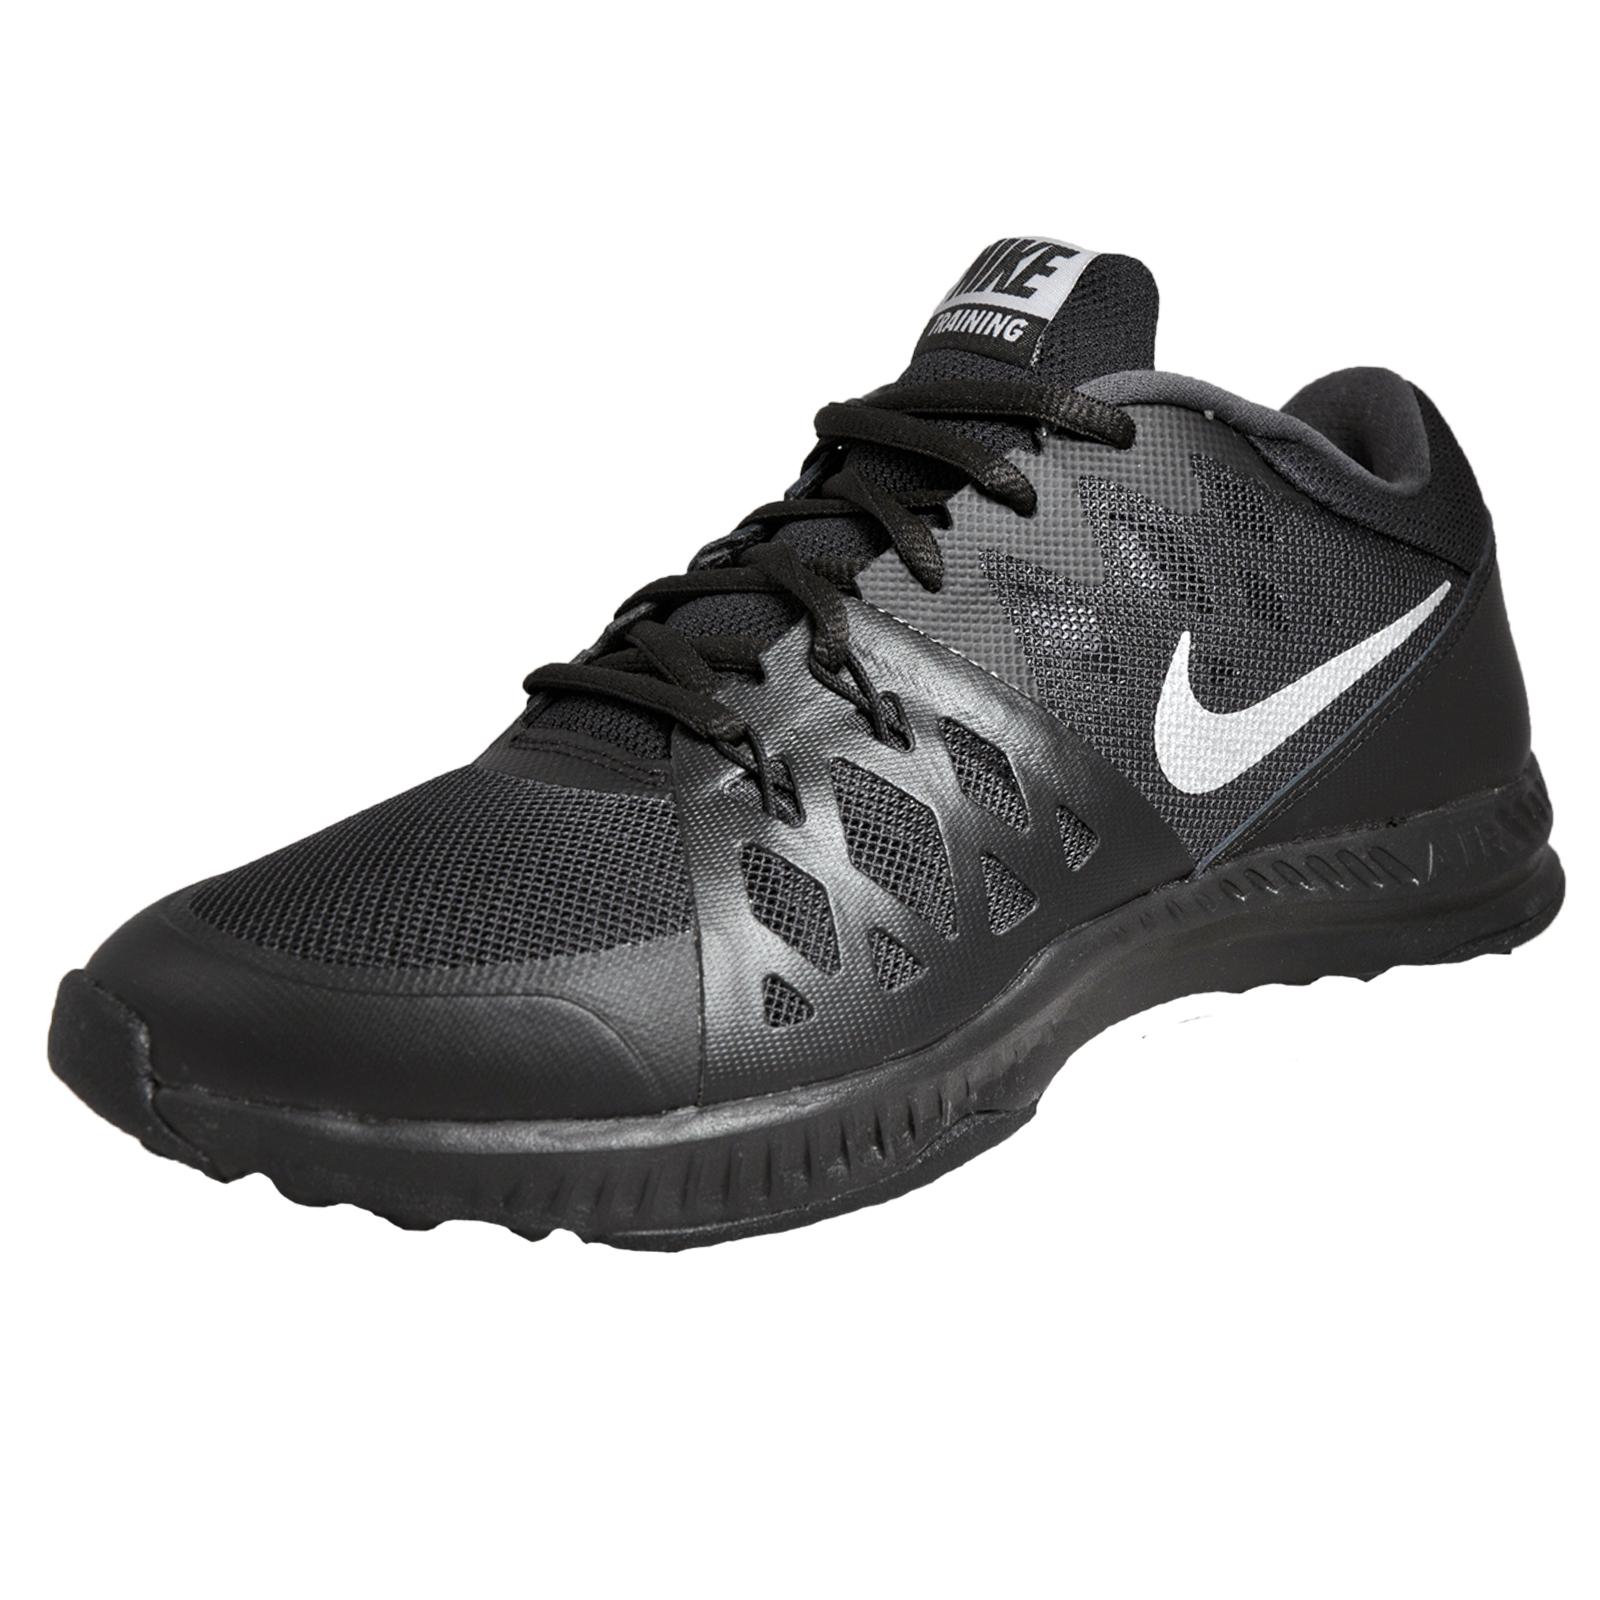 Nike Air Express Training Shoes